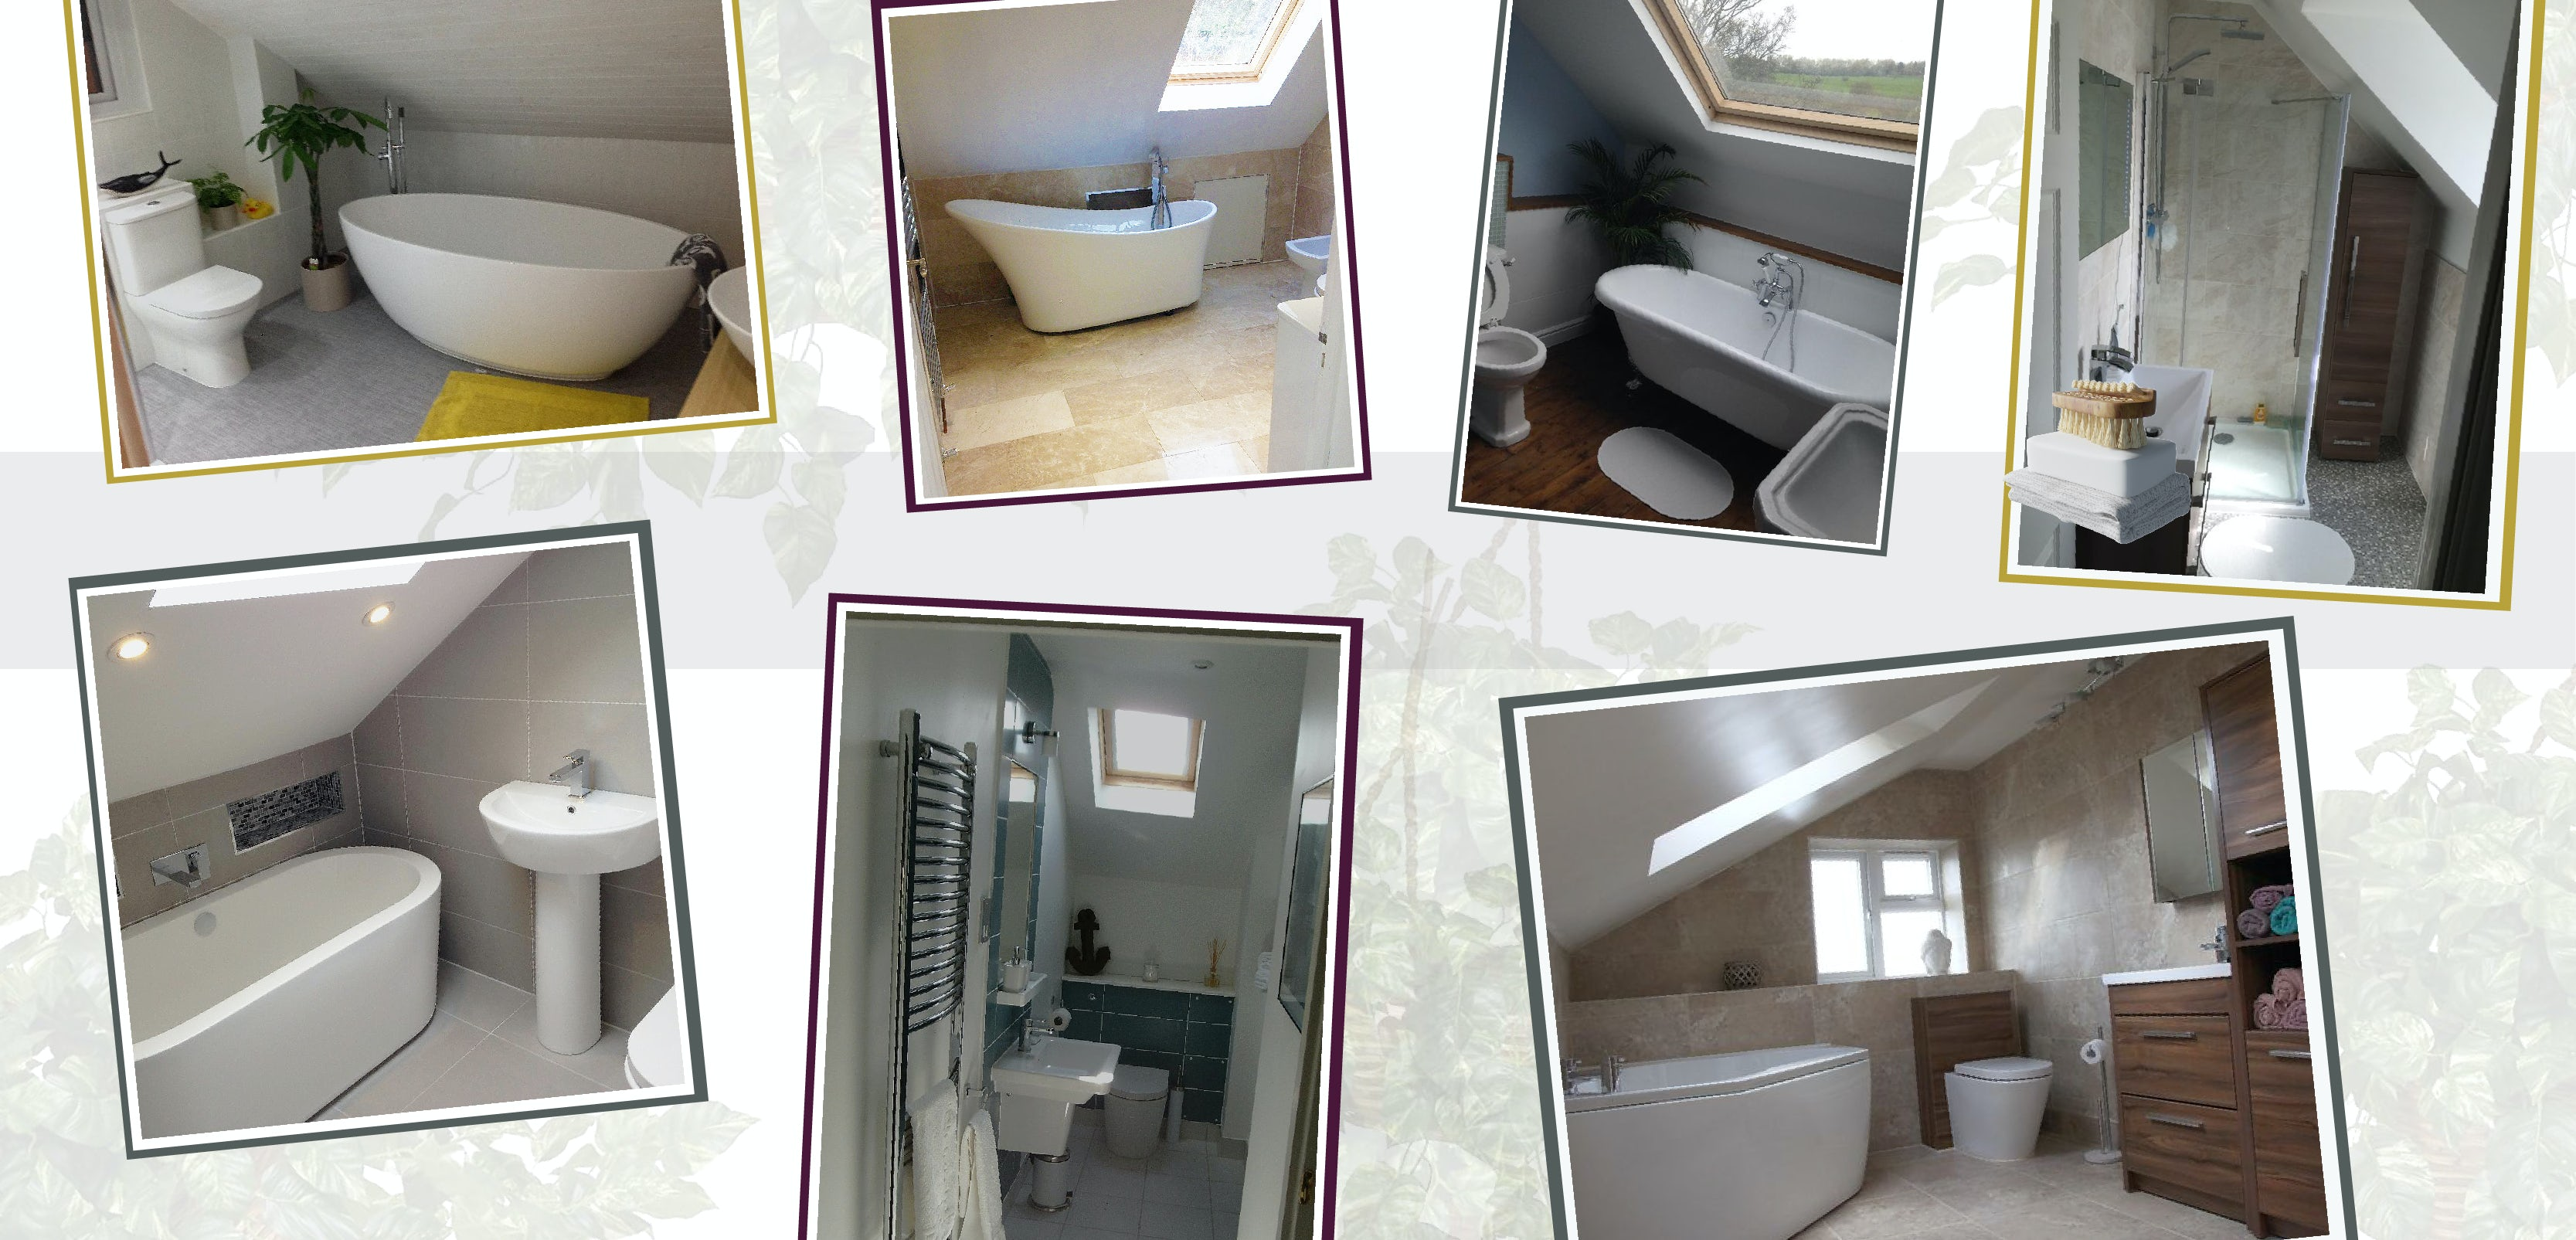 Trent bathroom suites - The Best Bathroom Suites For Loft Conversions